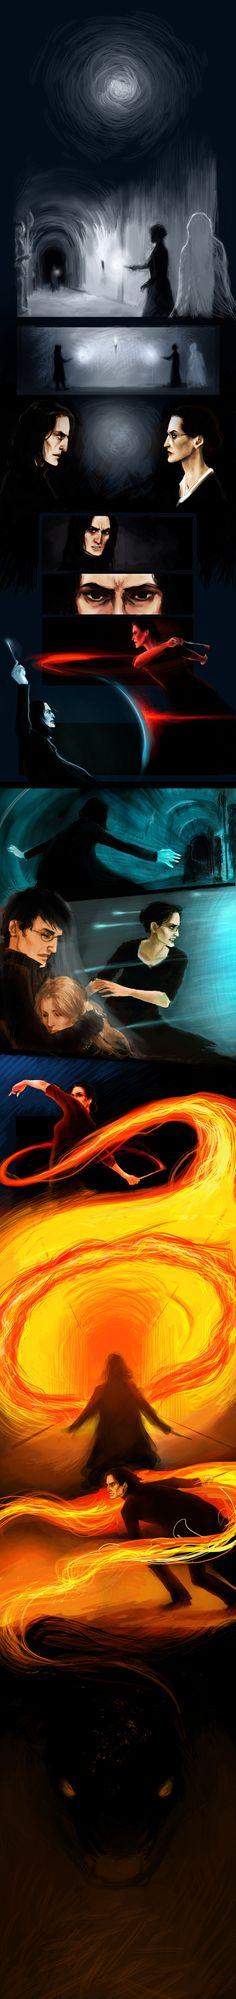 Deathly Hallows Fight part 1 by ehay.deviantart.com on @deviantART